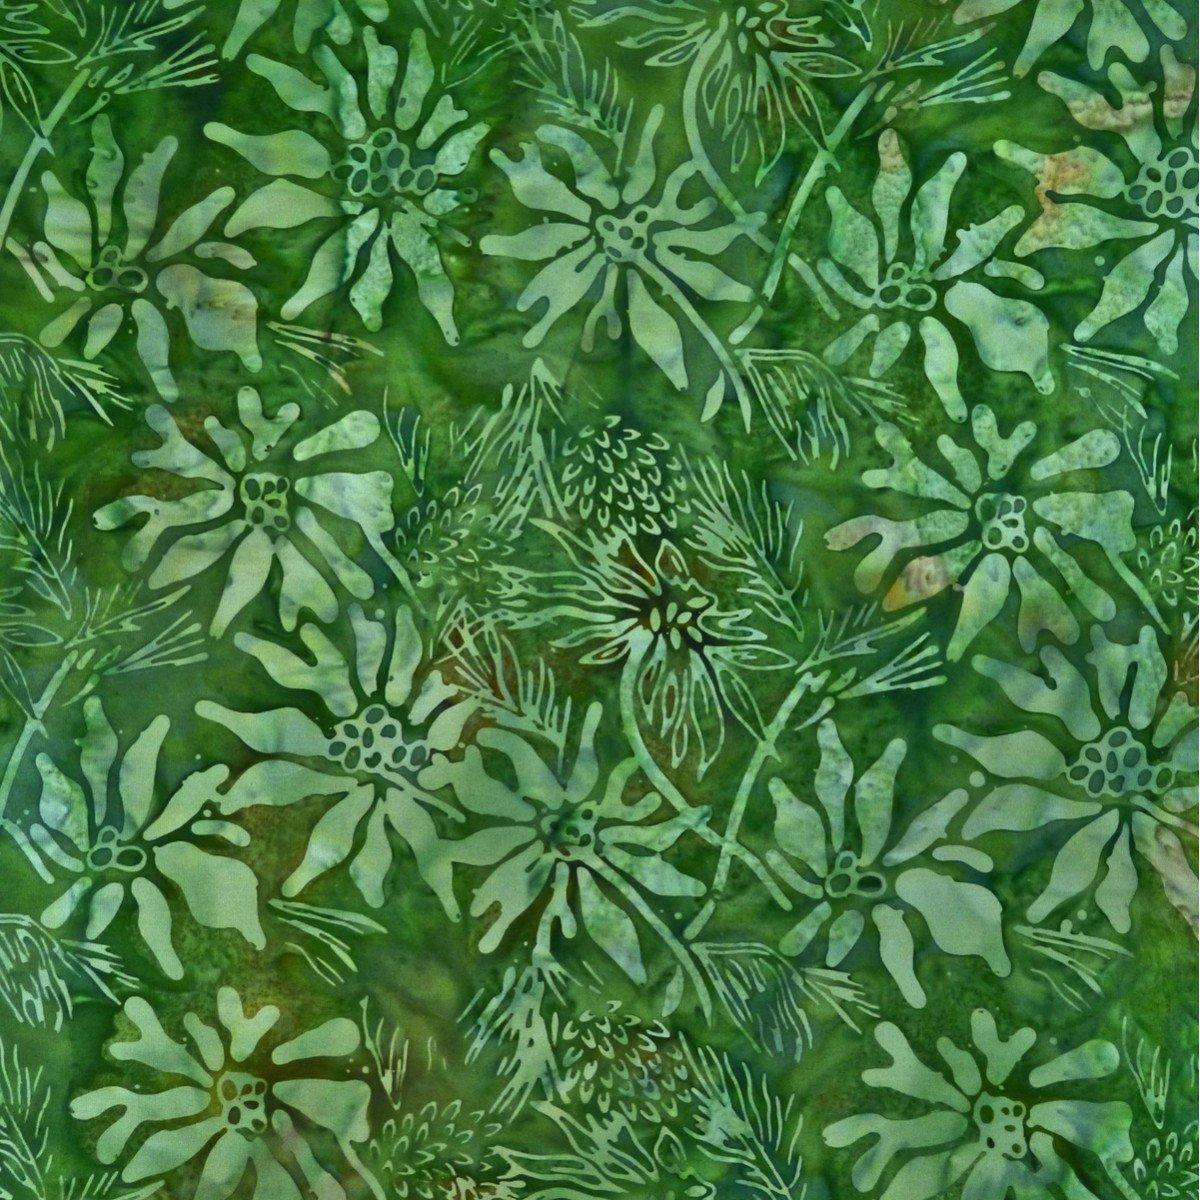 Sulphur Green DY-8 1678